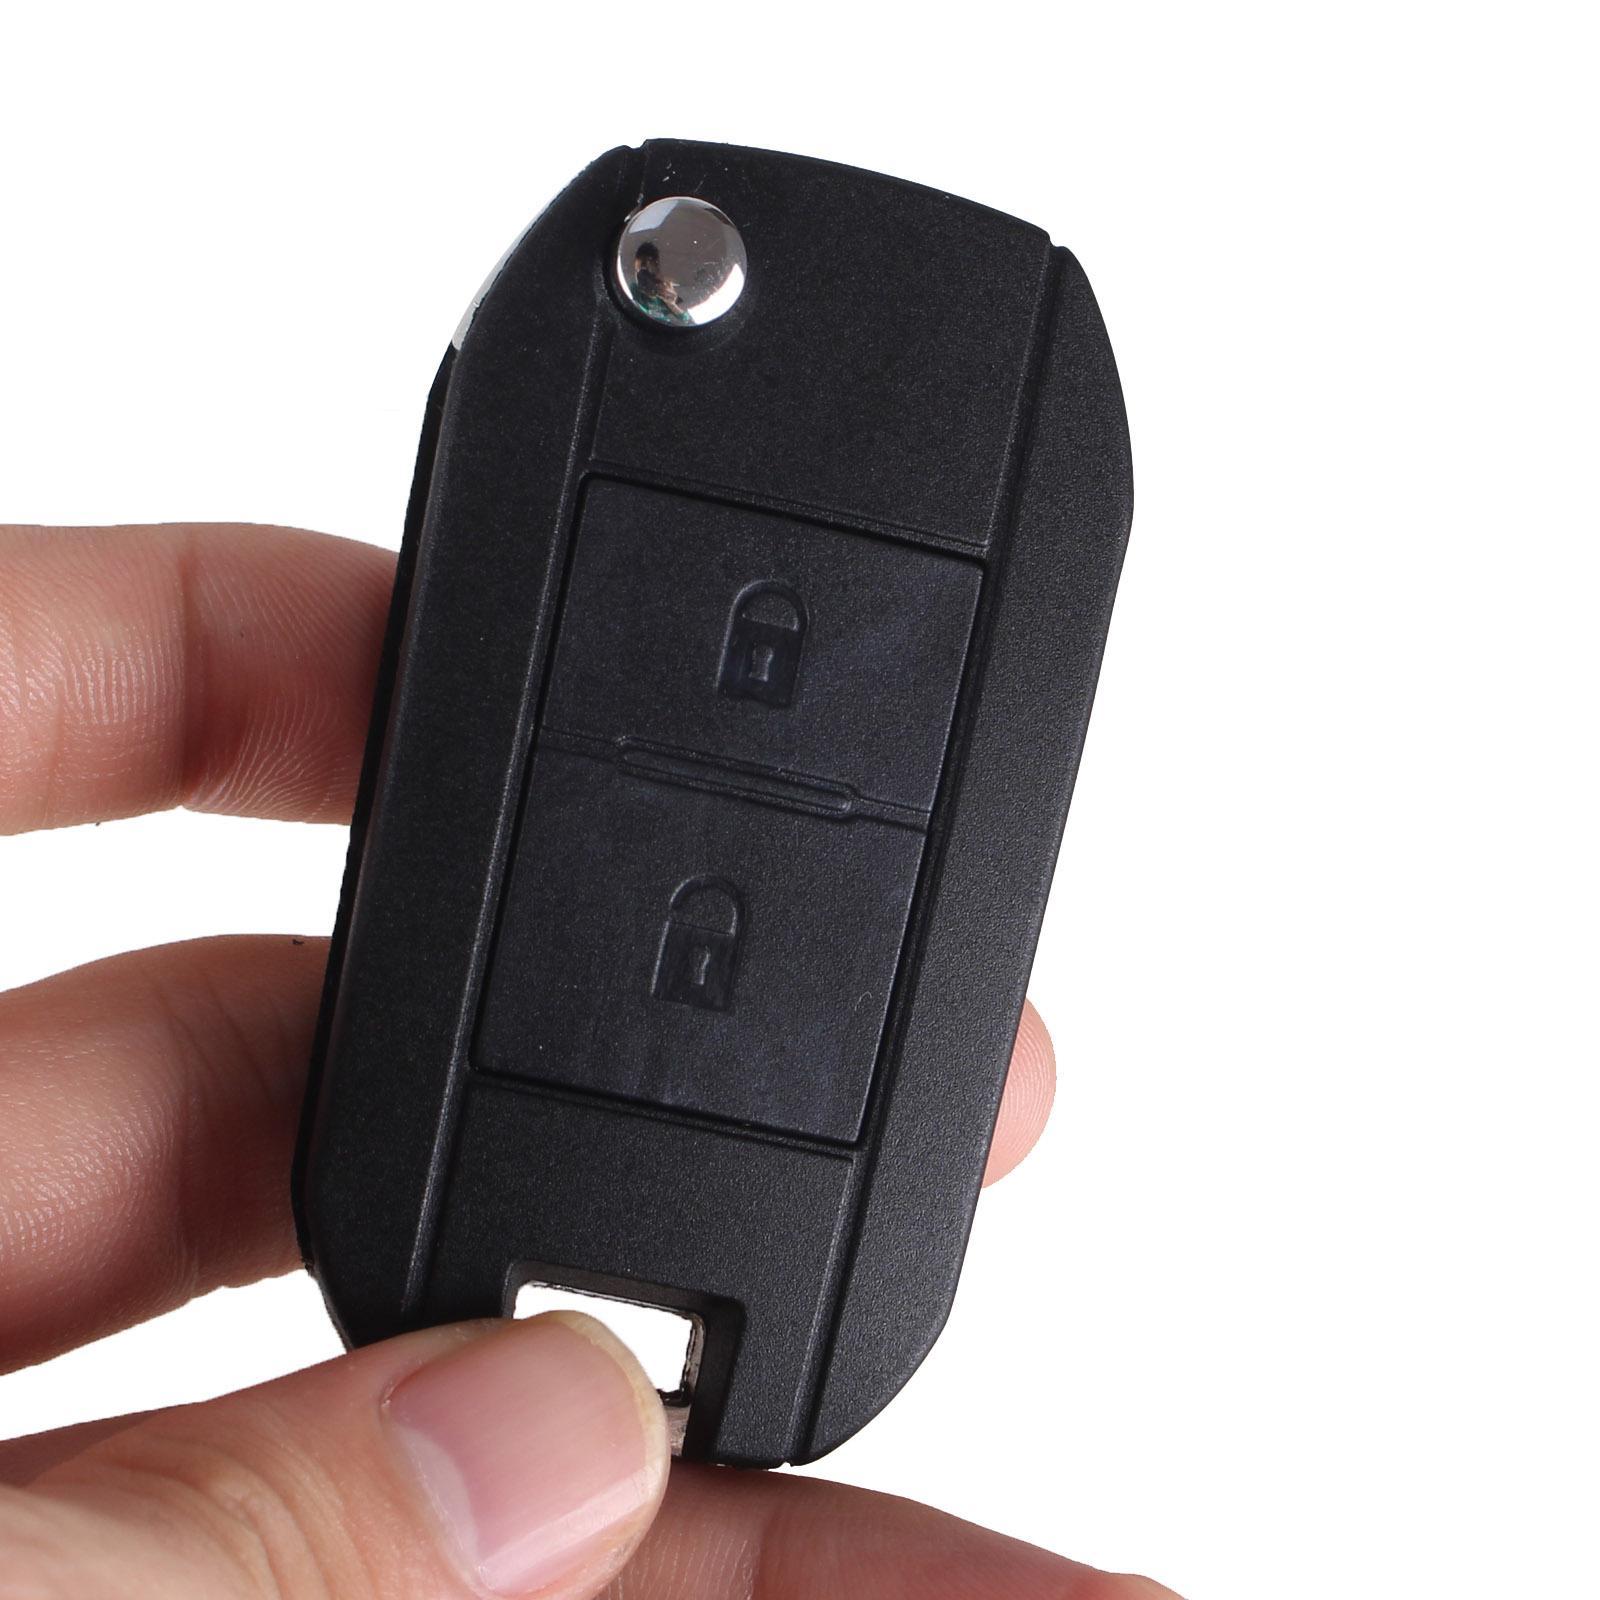 Peugeot 407 2 botón cáscara de la llave con HU83 lámina